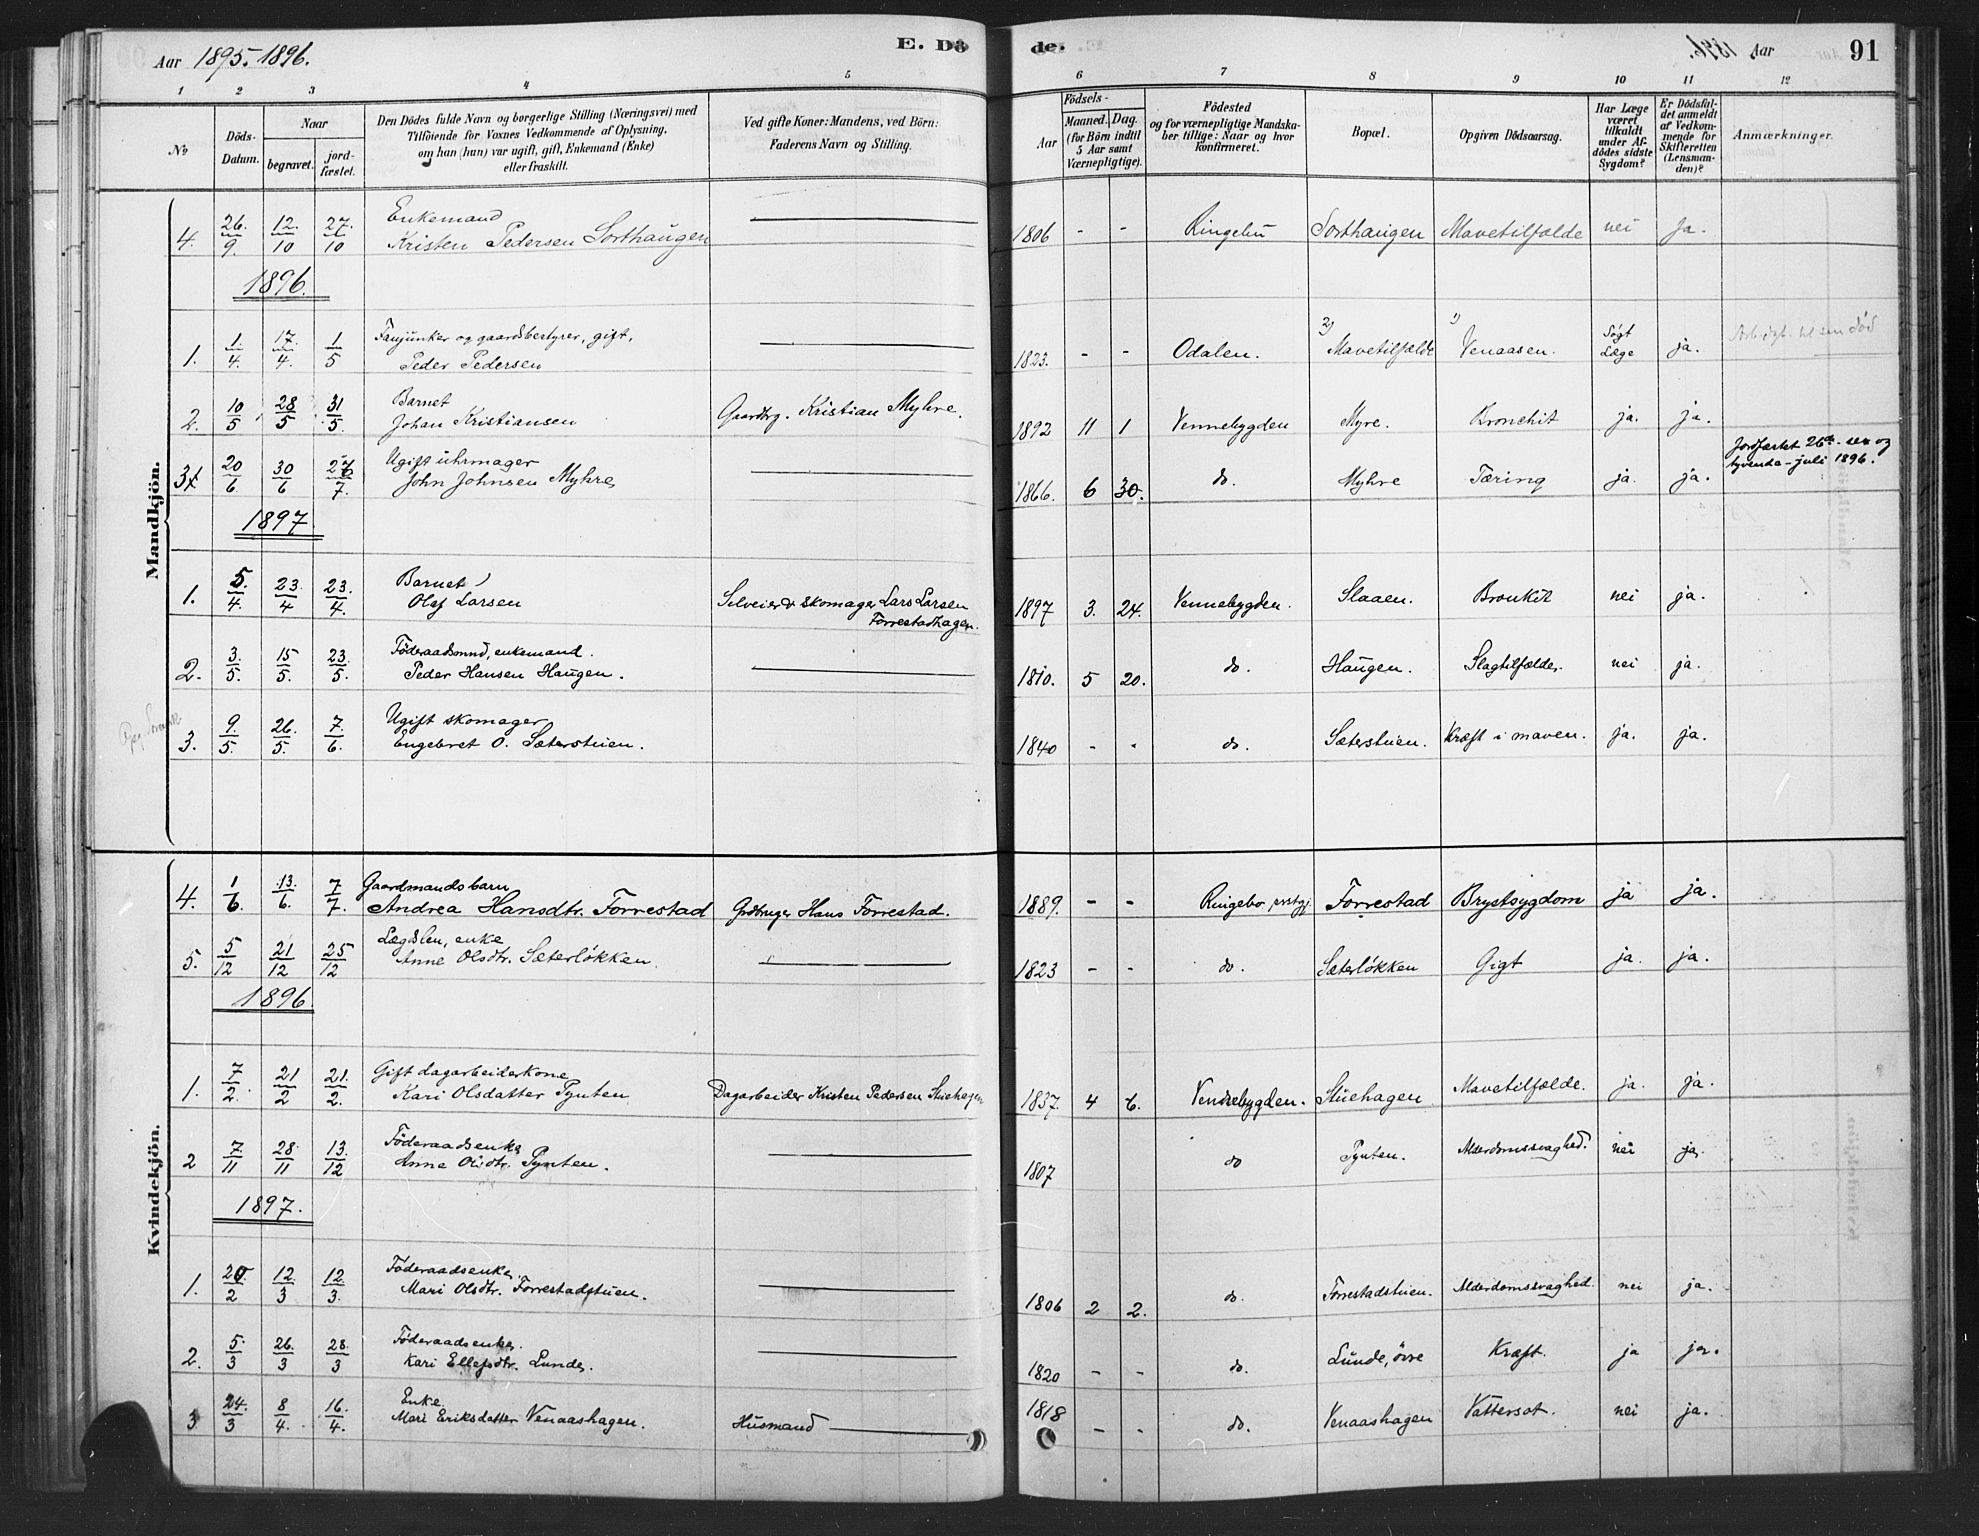 SAH, Ringebu prestekontor, Ministerialbok nr. 10, 1878-1898, s. 91